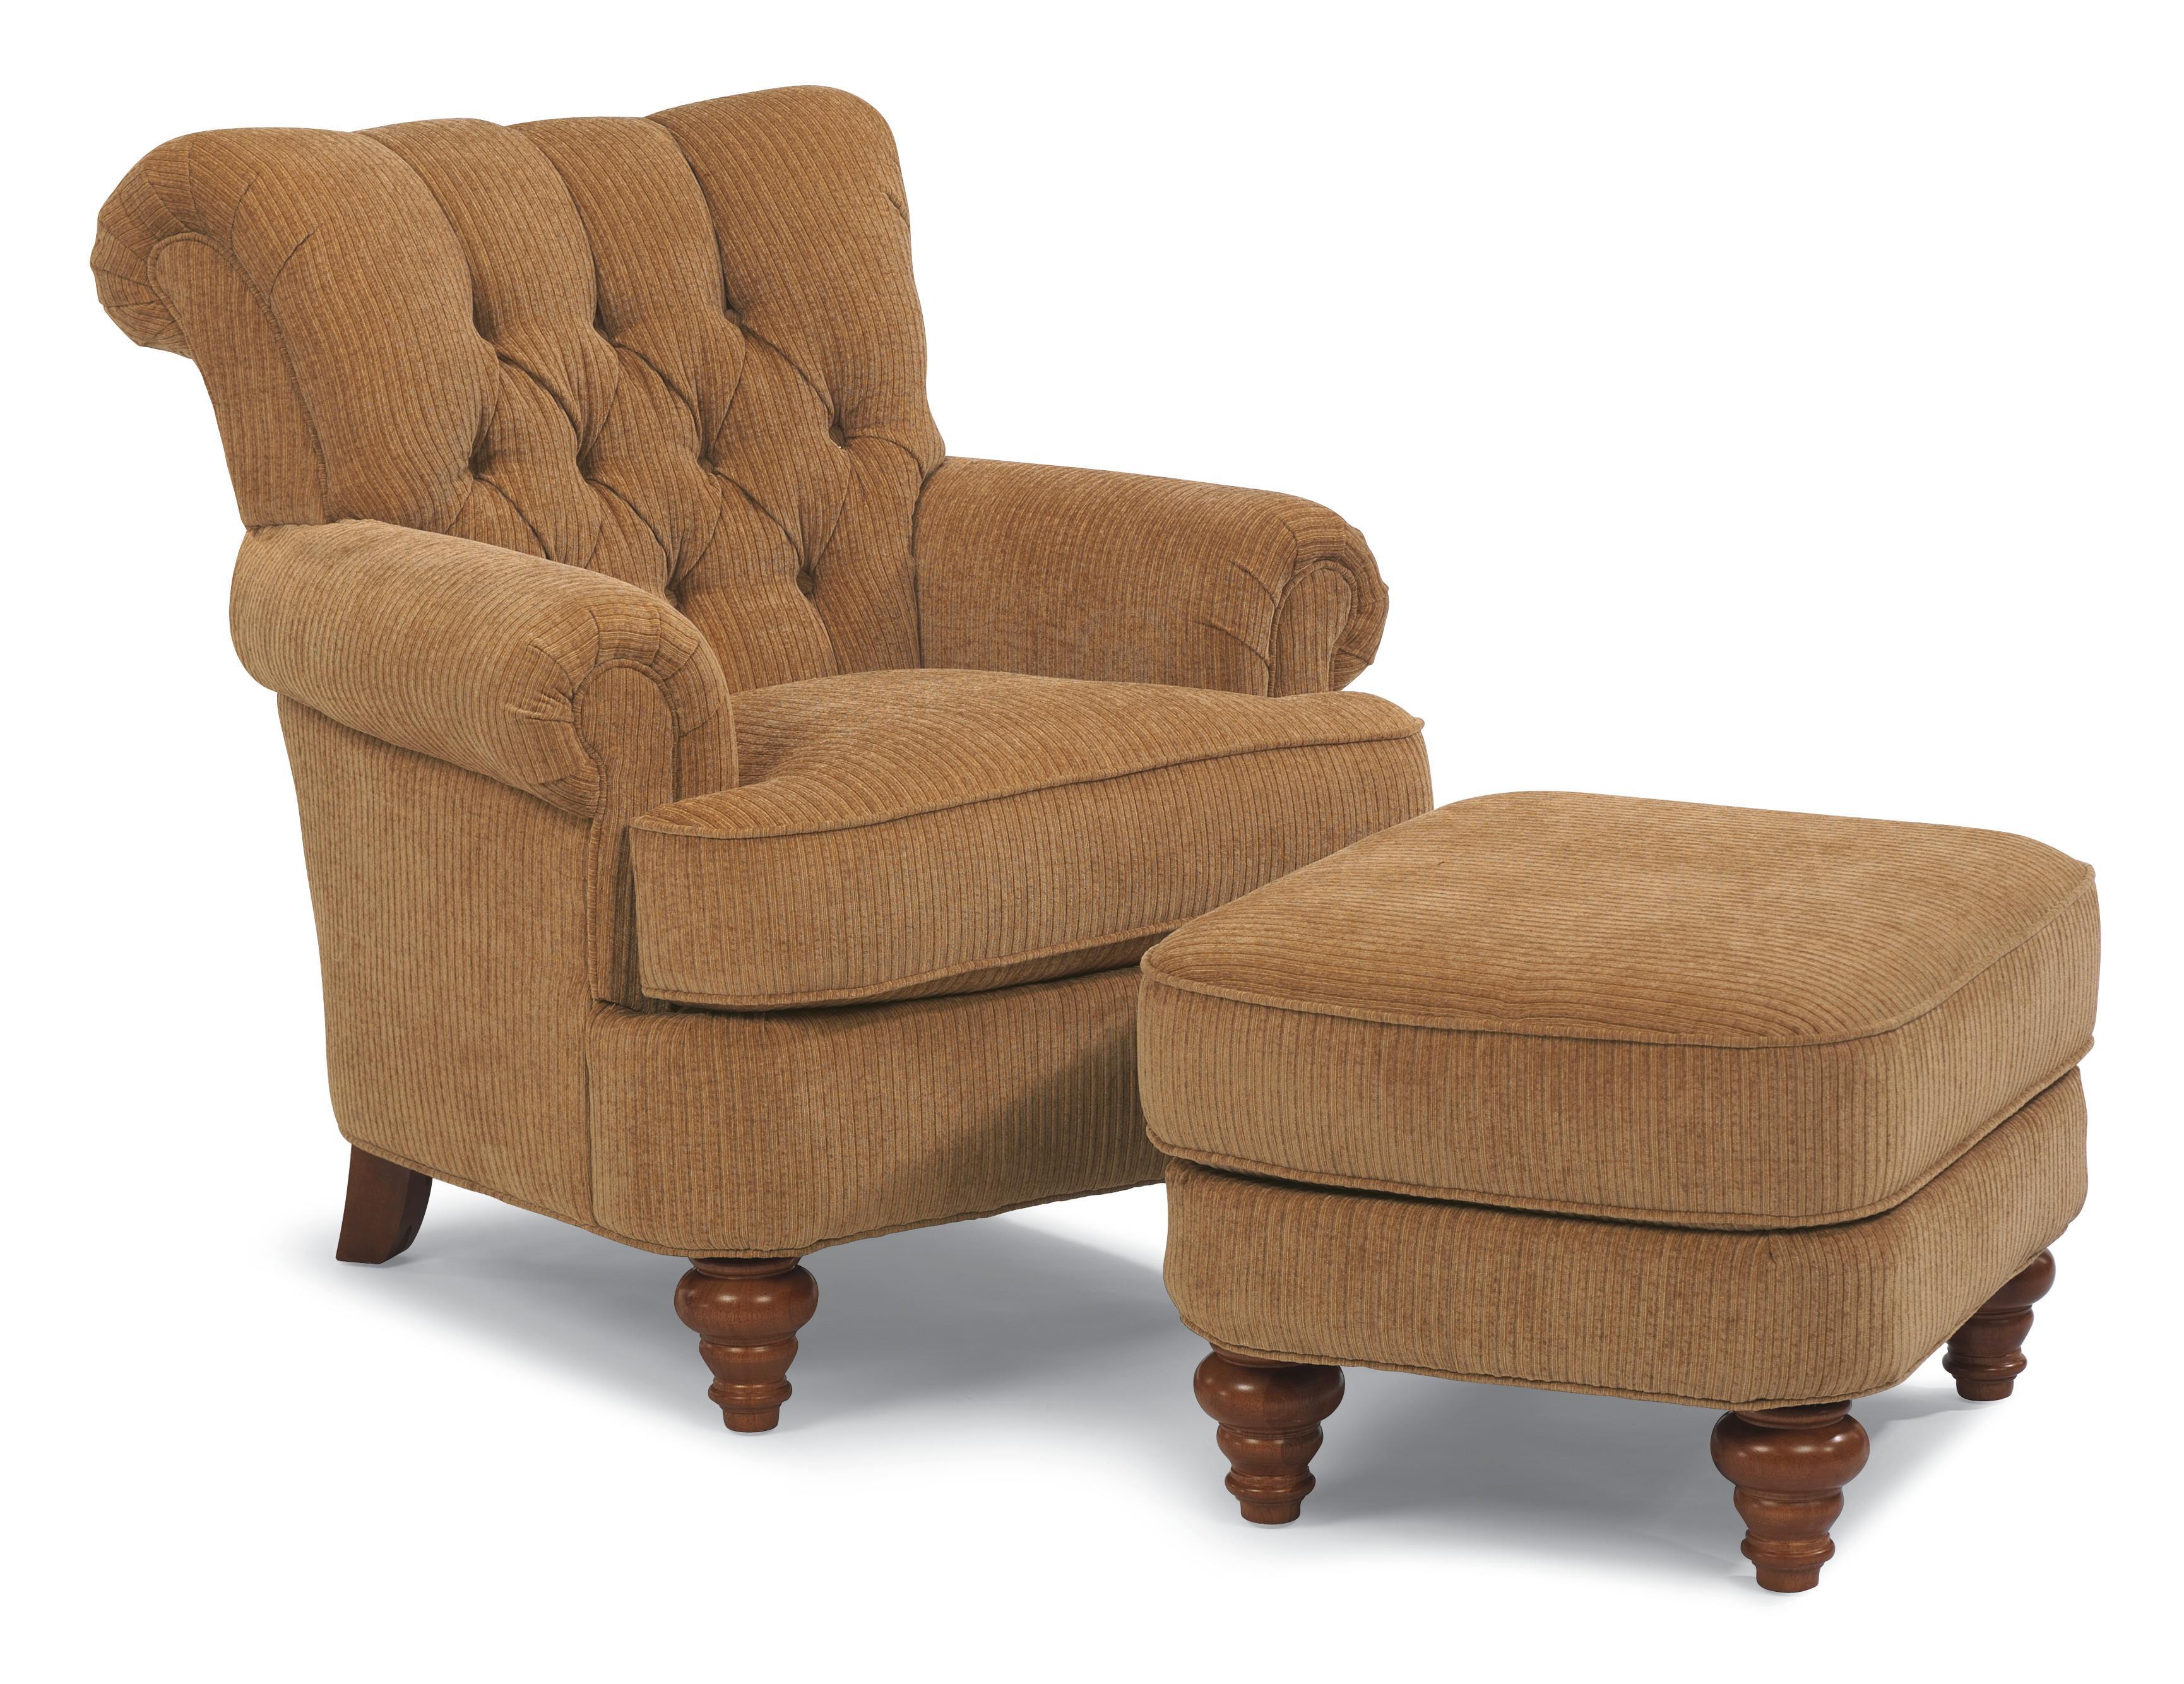 Flexsteel South Hampton South Hampton Chair and Ottoman AHFA